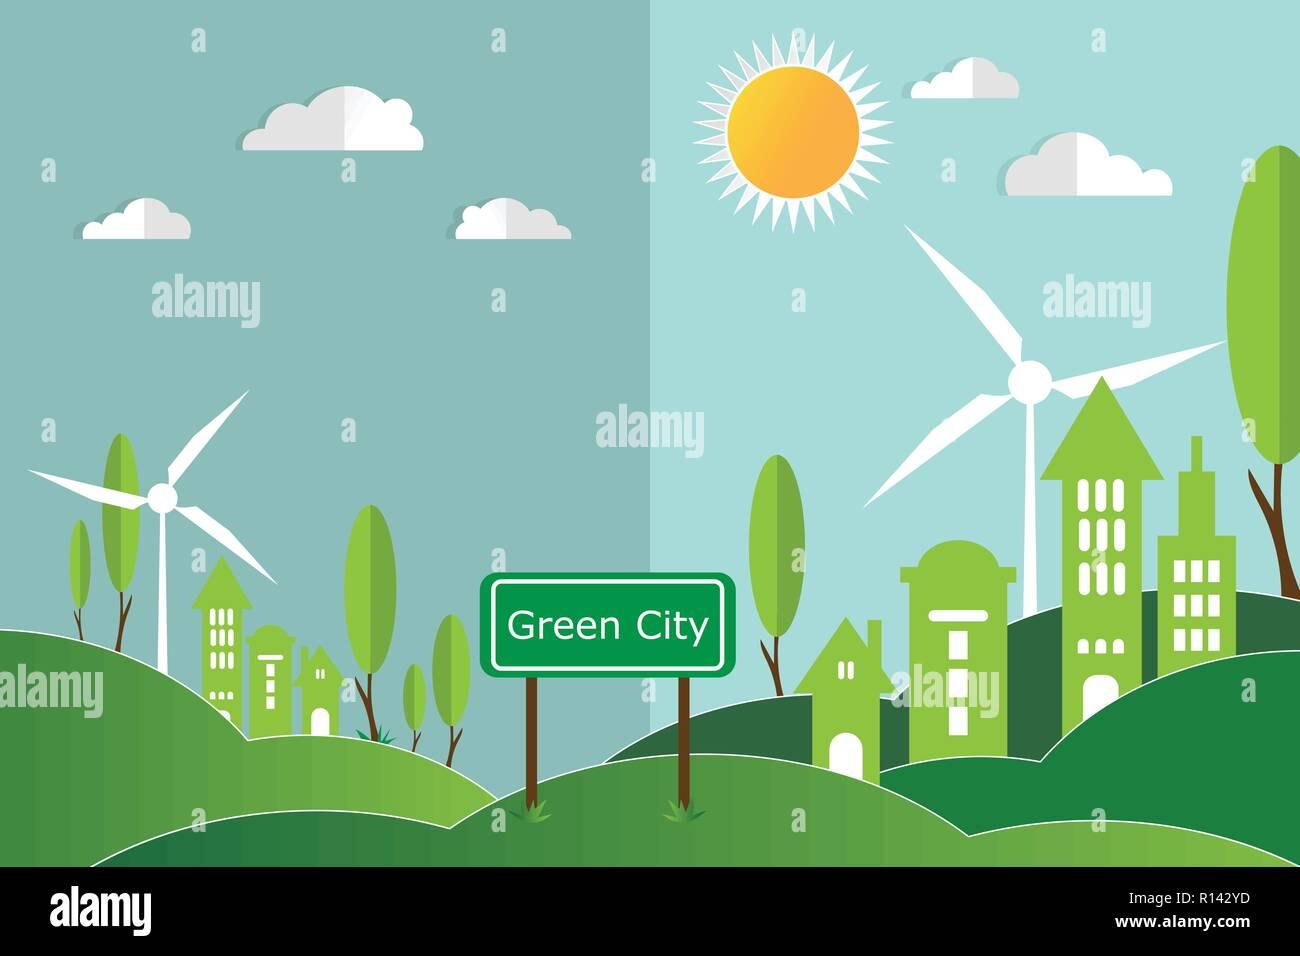 Eco Green City Concept Vector Illustration Stock Vector Art